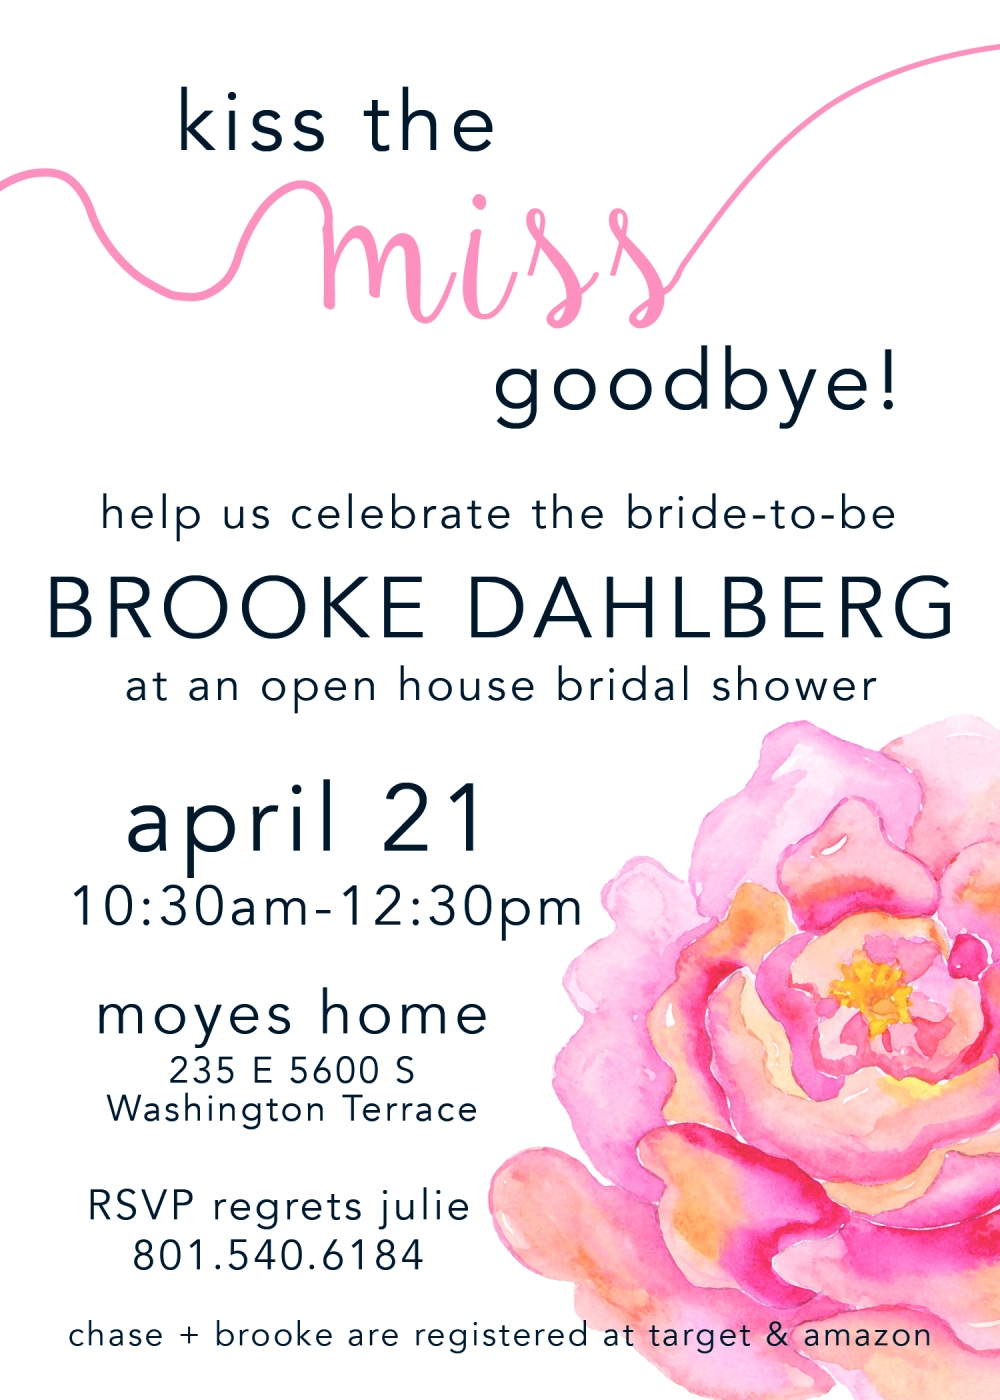 Brooke Dahlberg Bridal Shower Invite Design 2018